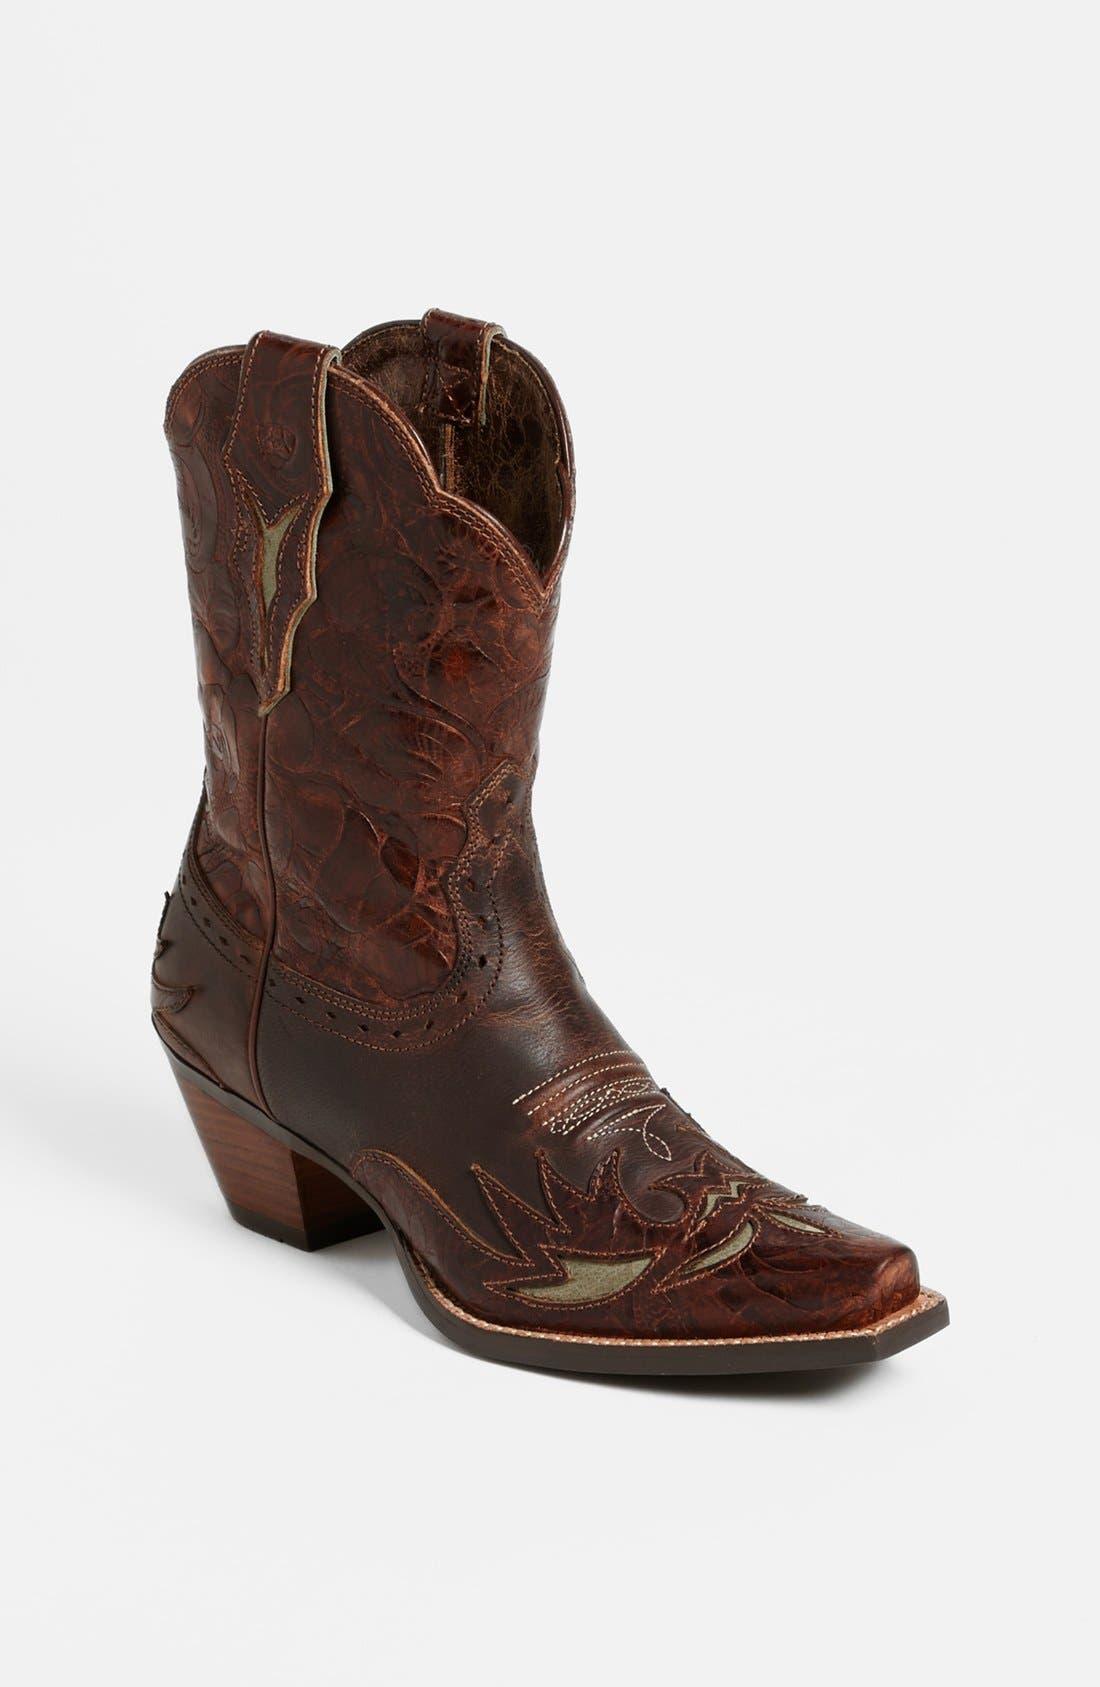 Alternate Image 1 Selected - Ariat 'Dahlia' Boot